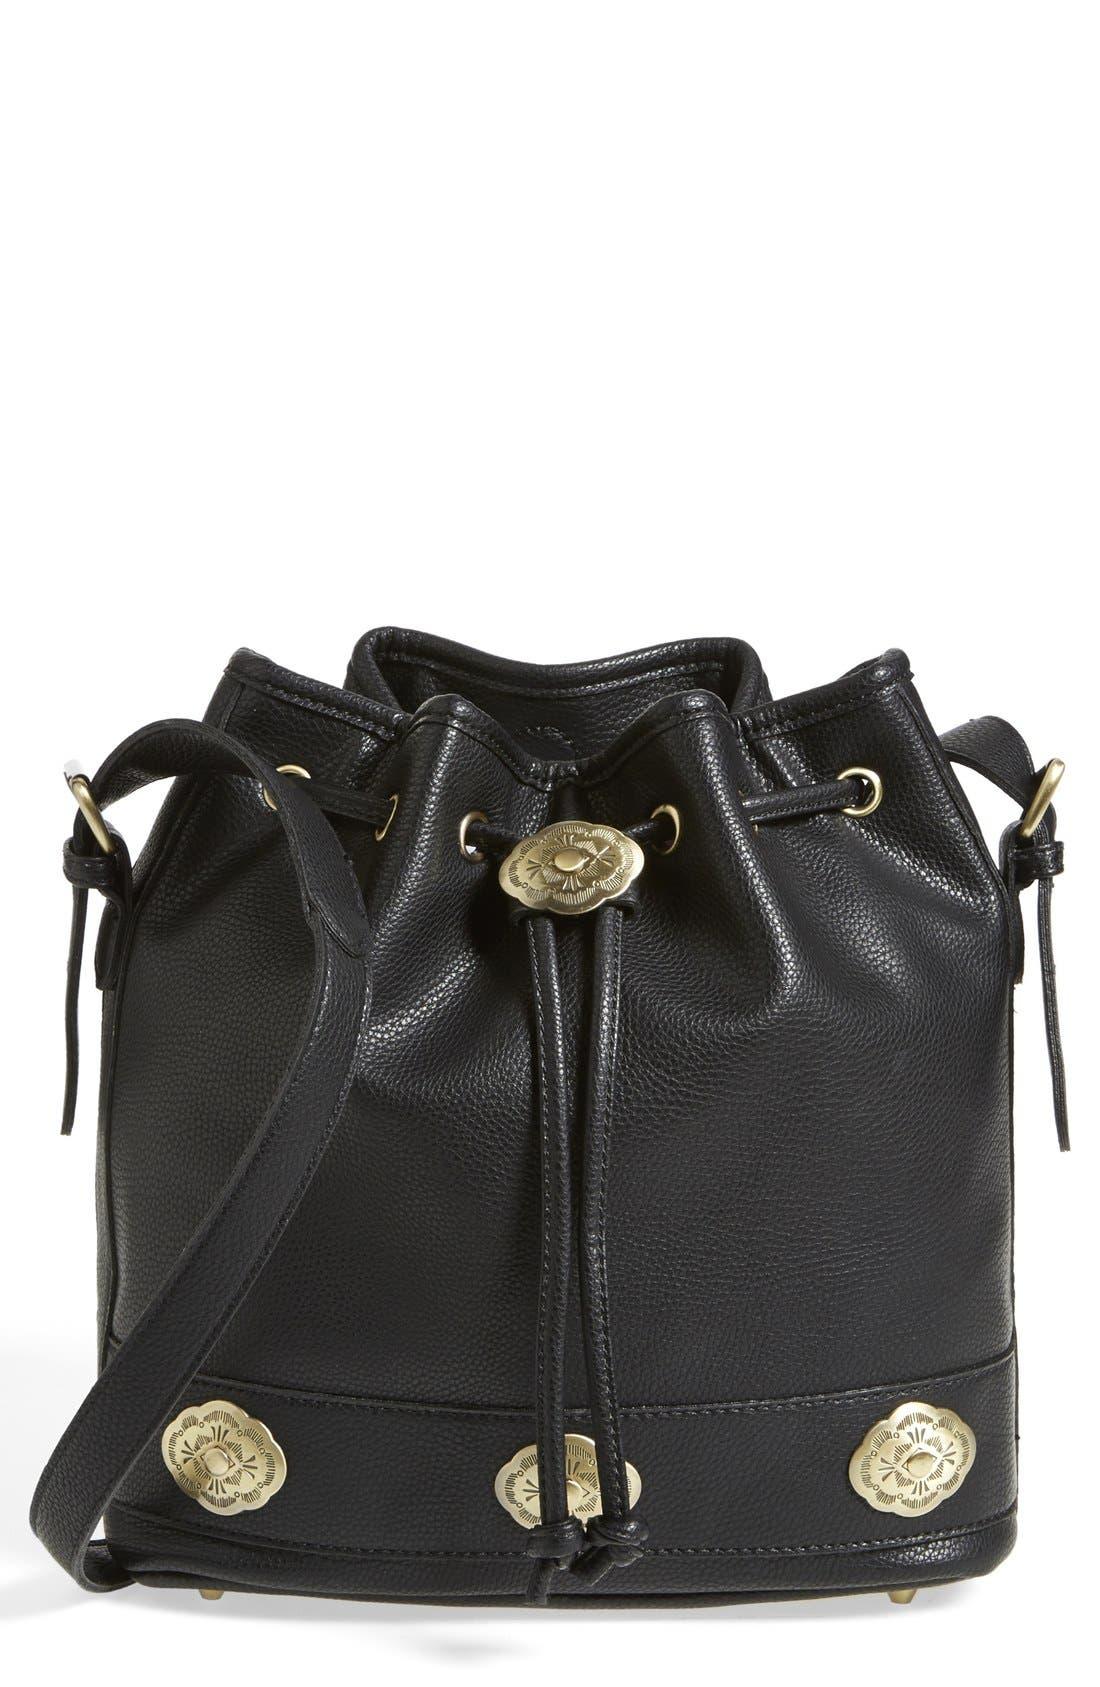 STREET LEVEL 'Concha' Faux Leather Bucket Bag, Main, color, 001